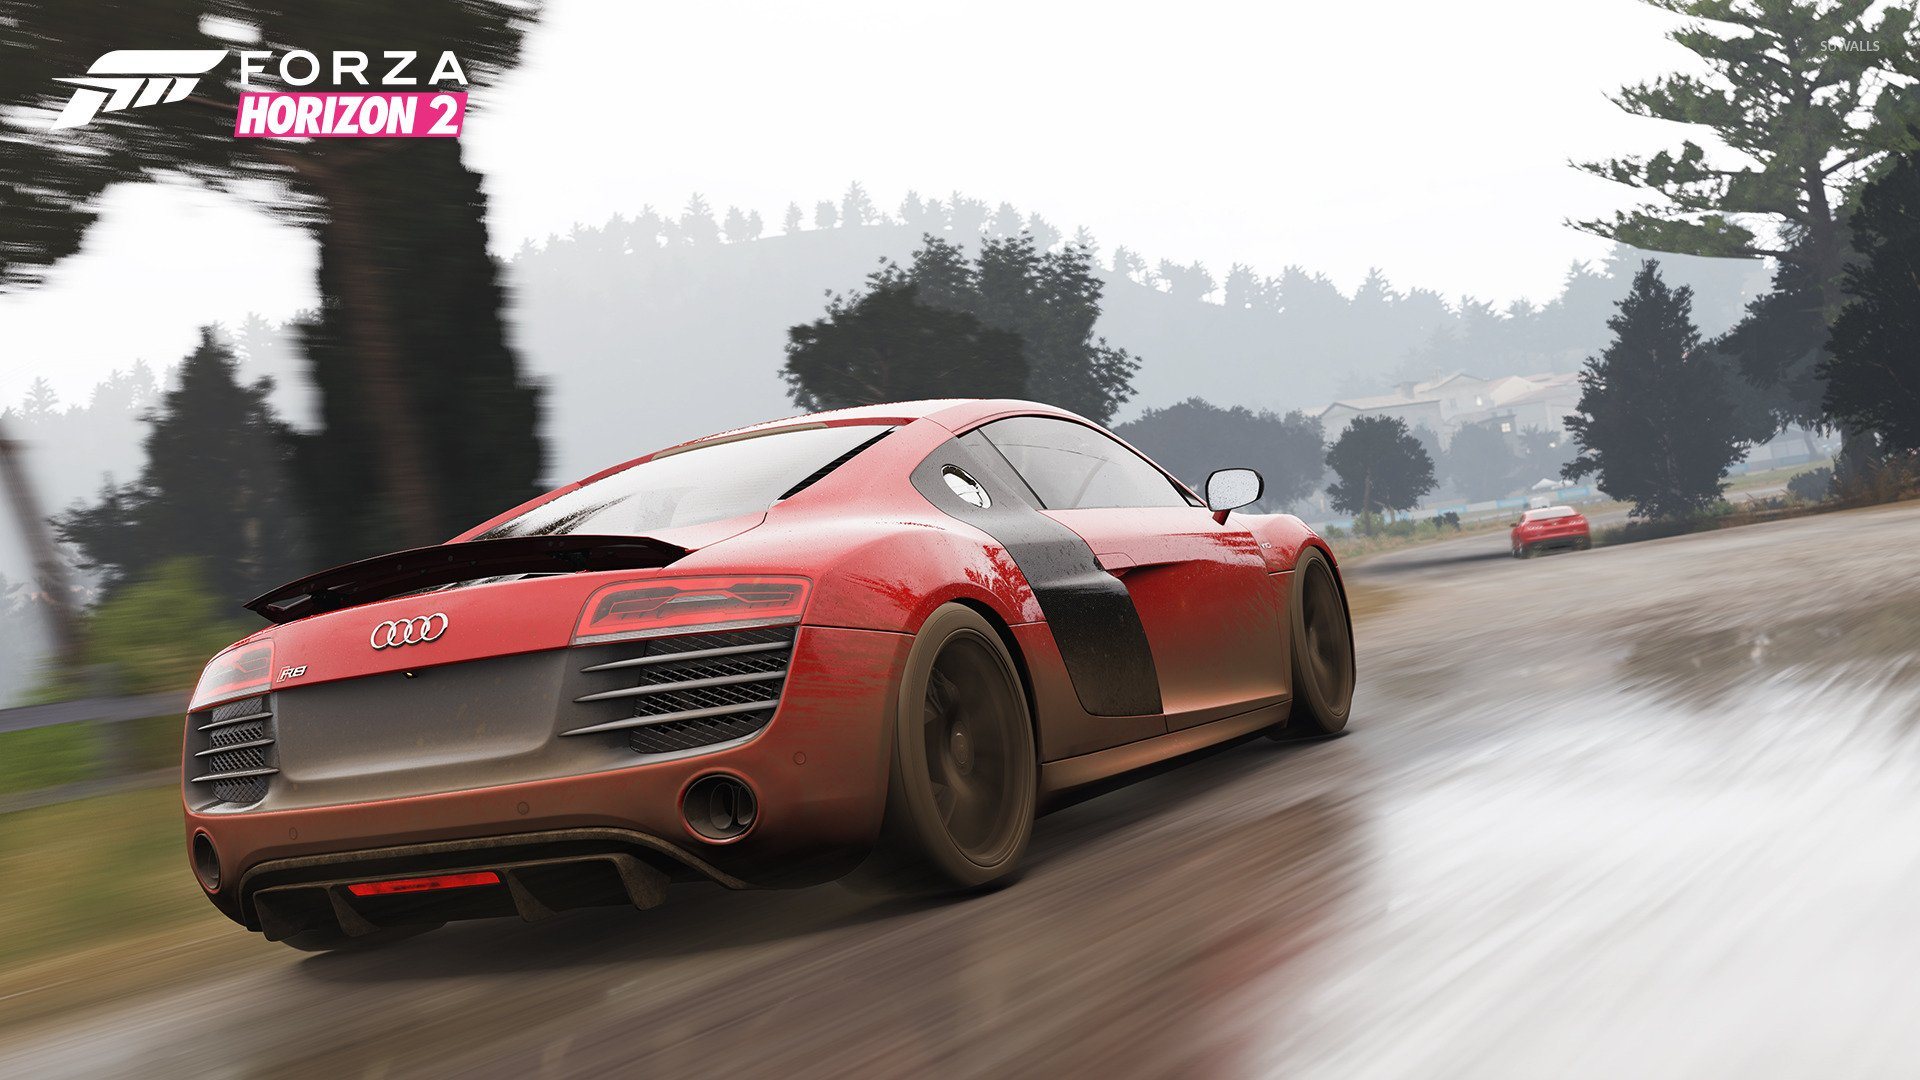 Forza Horizon 2 wallpaper   Game wallpapers   32210 1920x1080